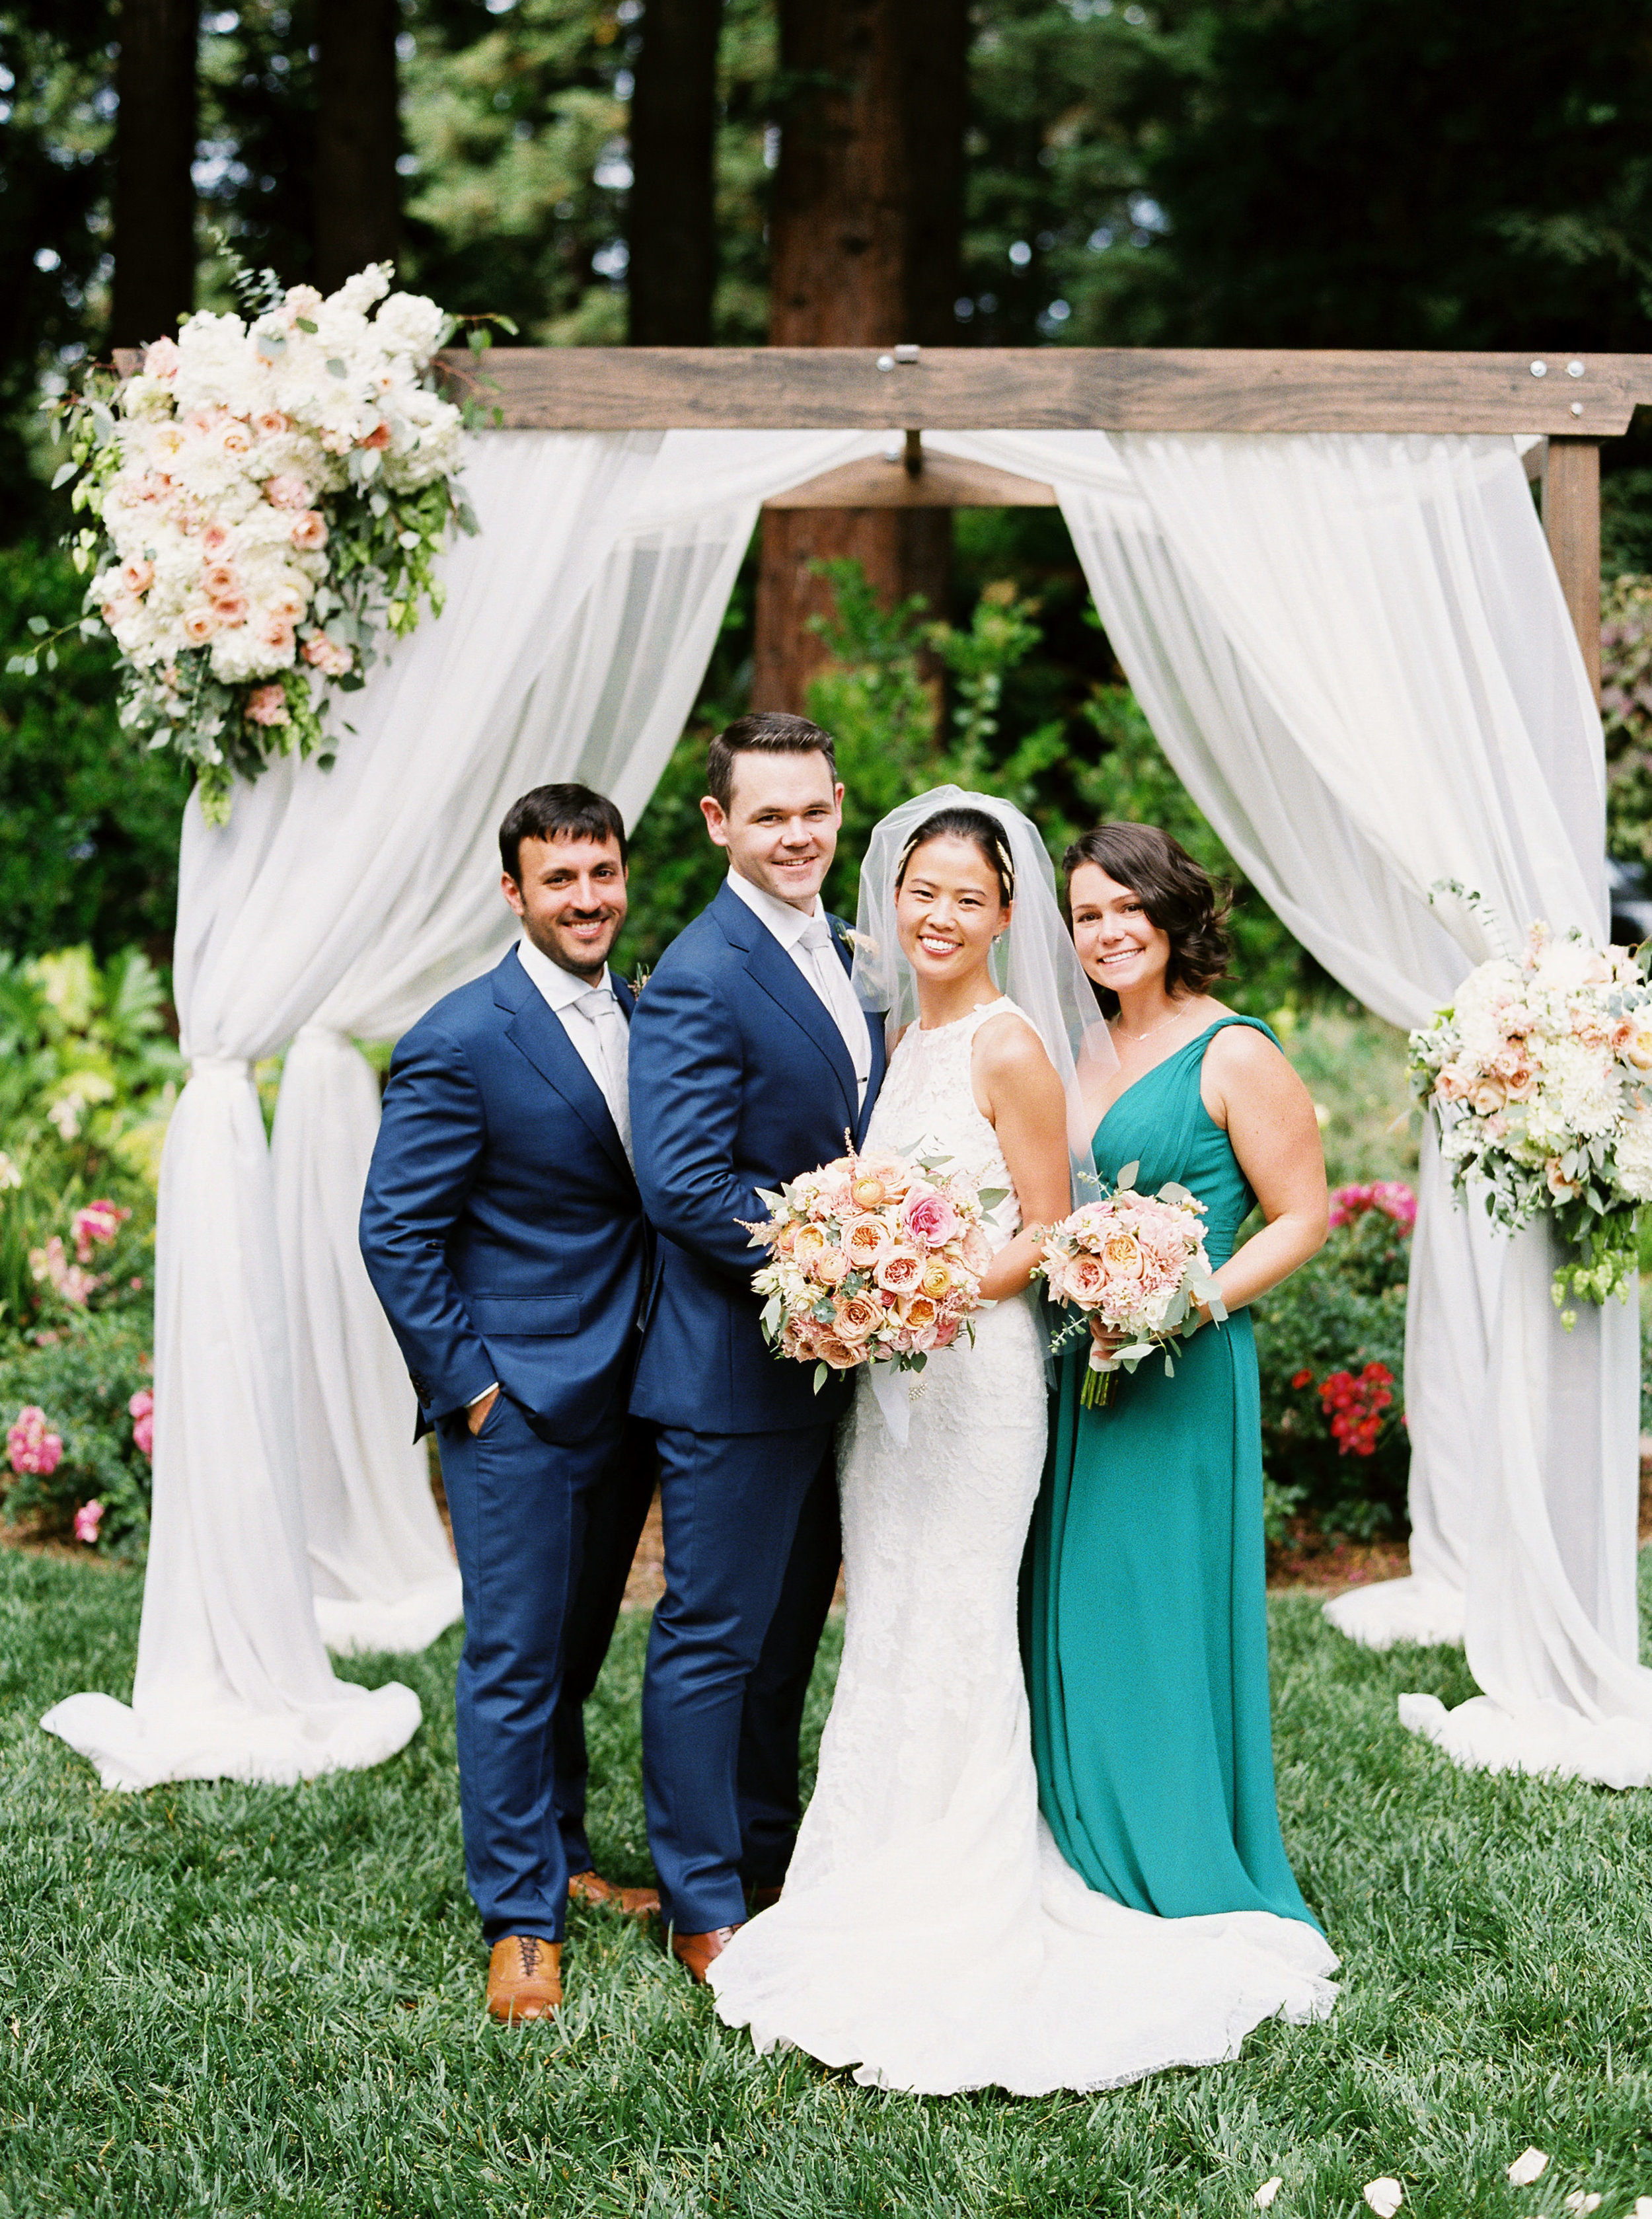 Harvest-inn-wedding-in-napa-california-36.jpg